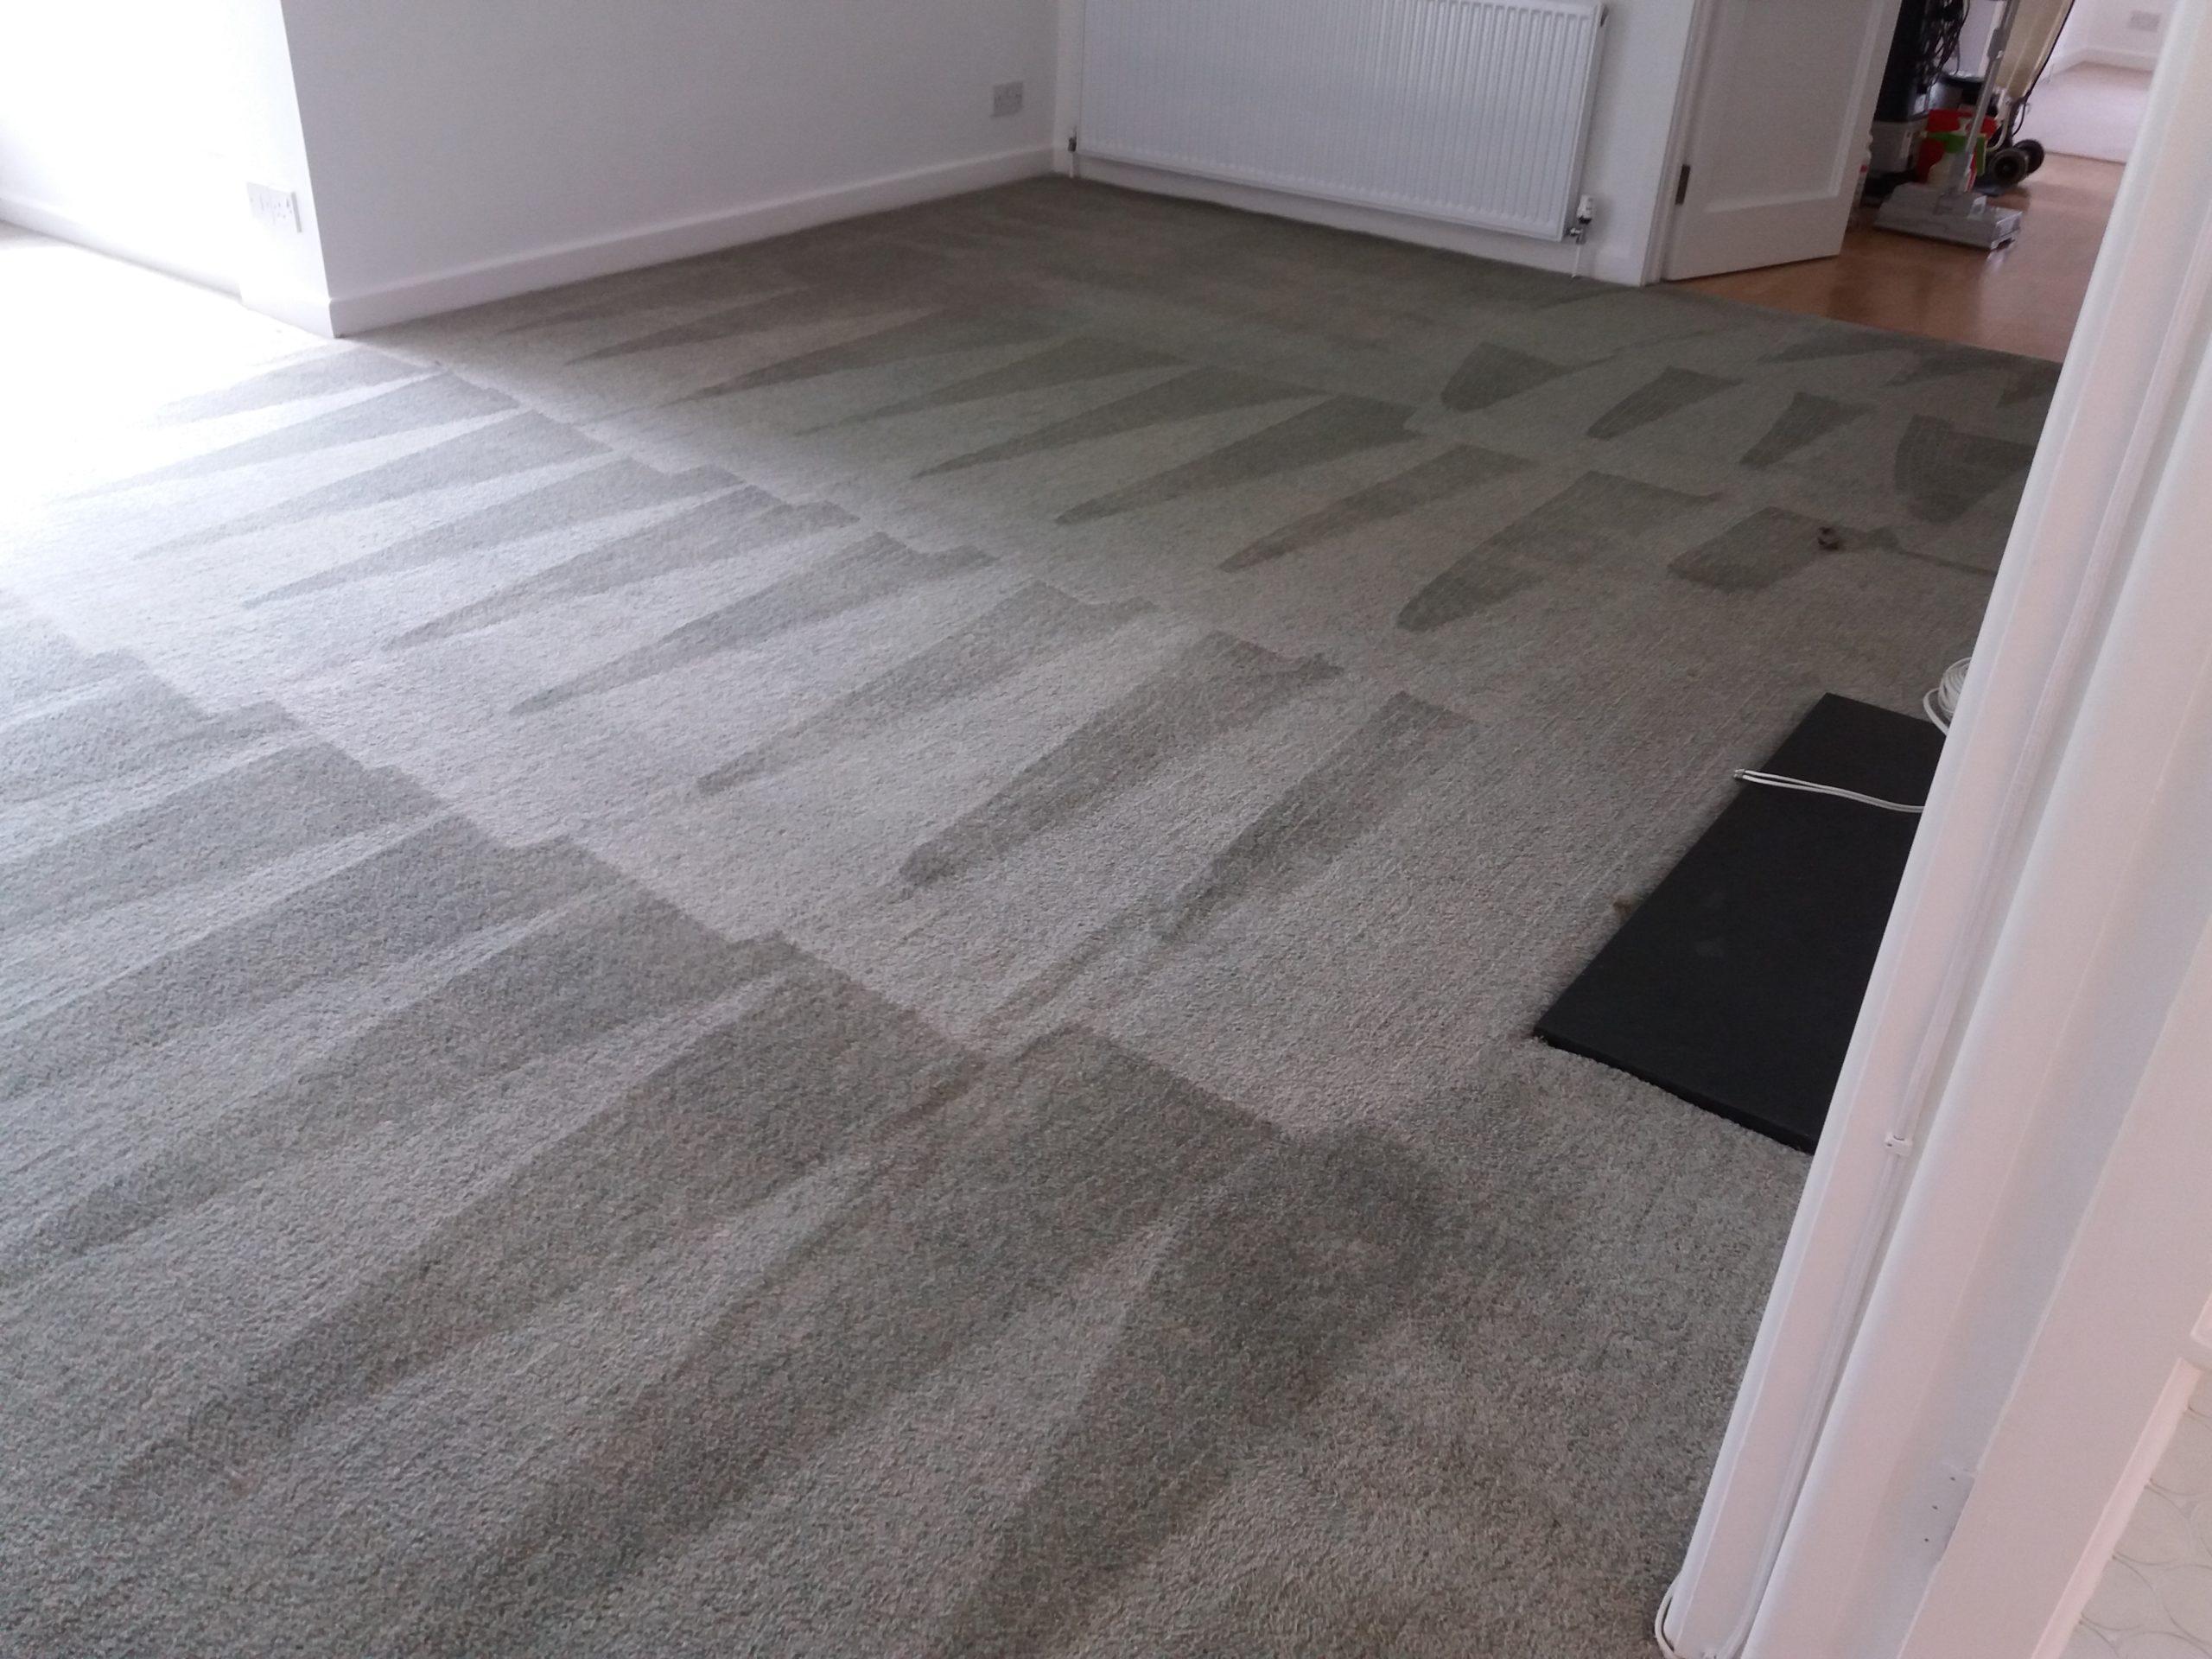 carpet cleaning companies adderbury